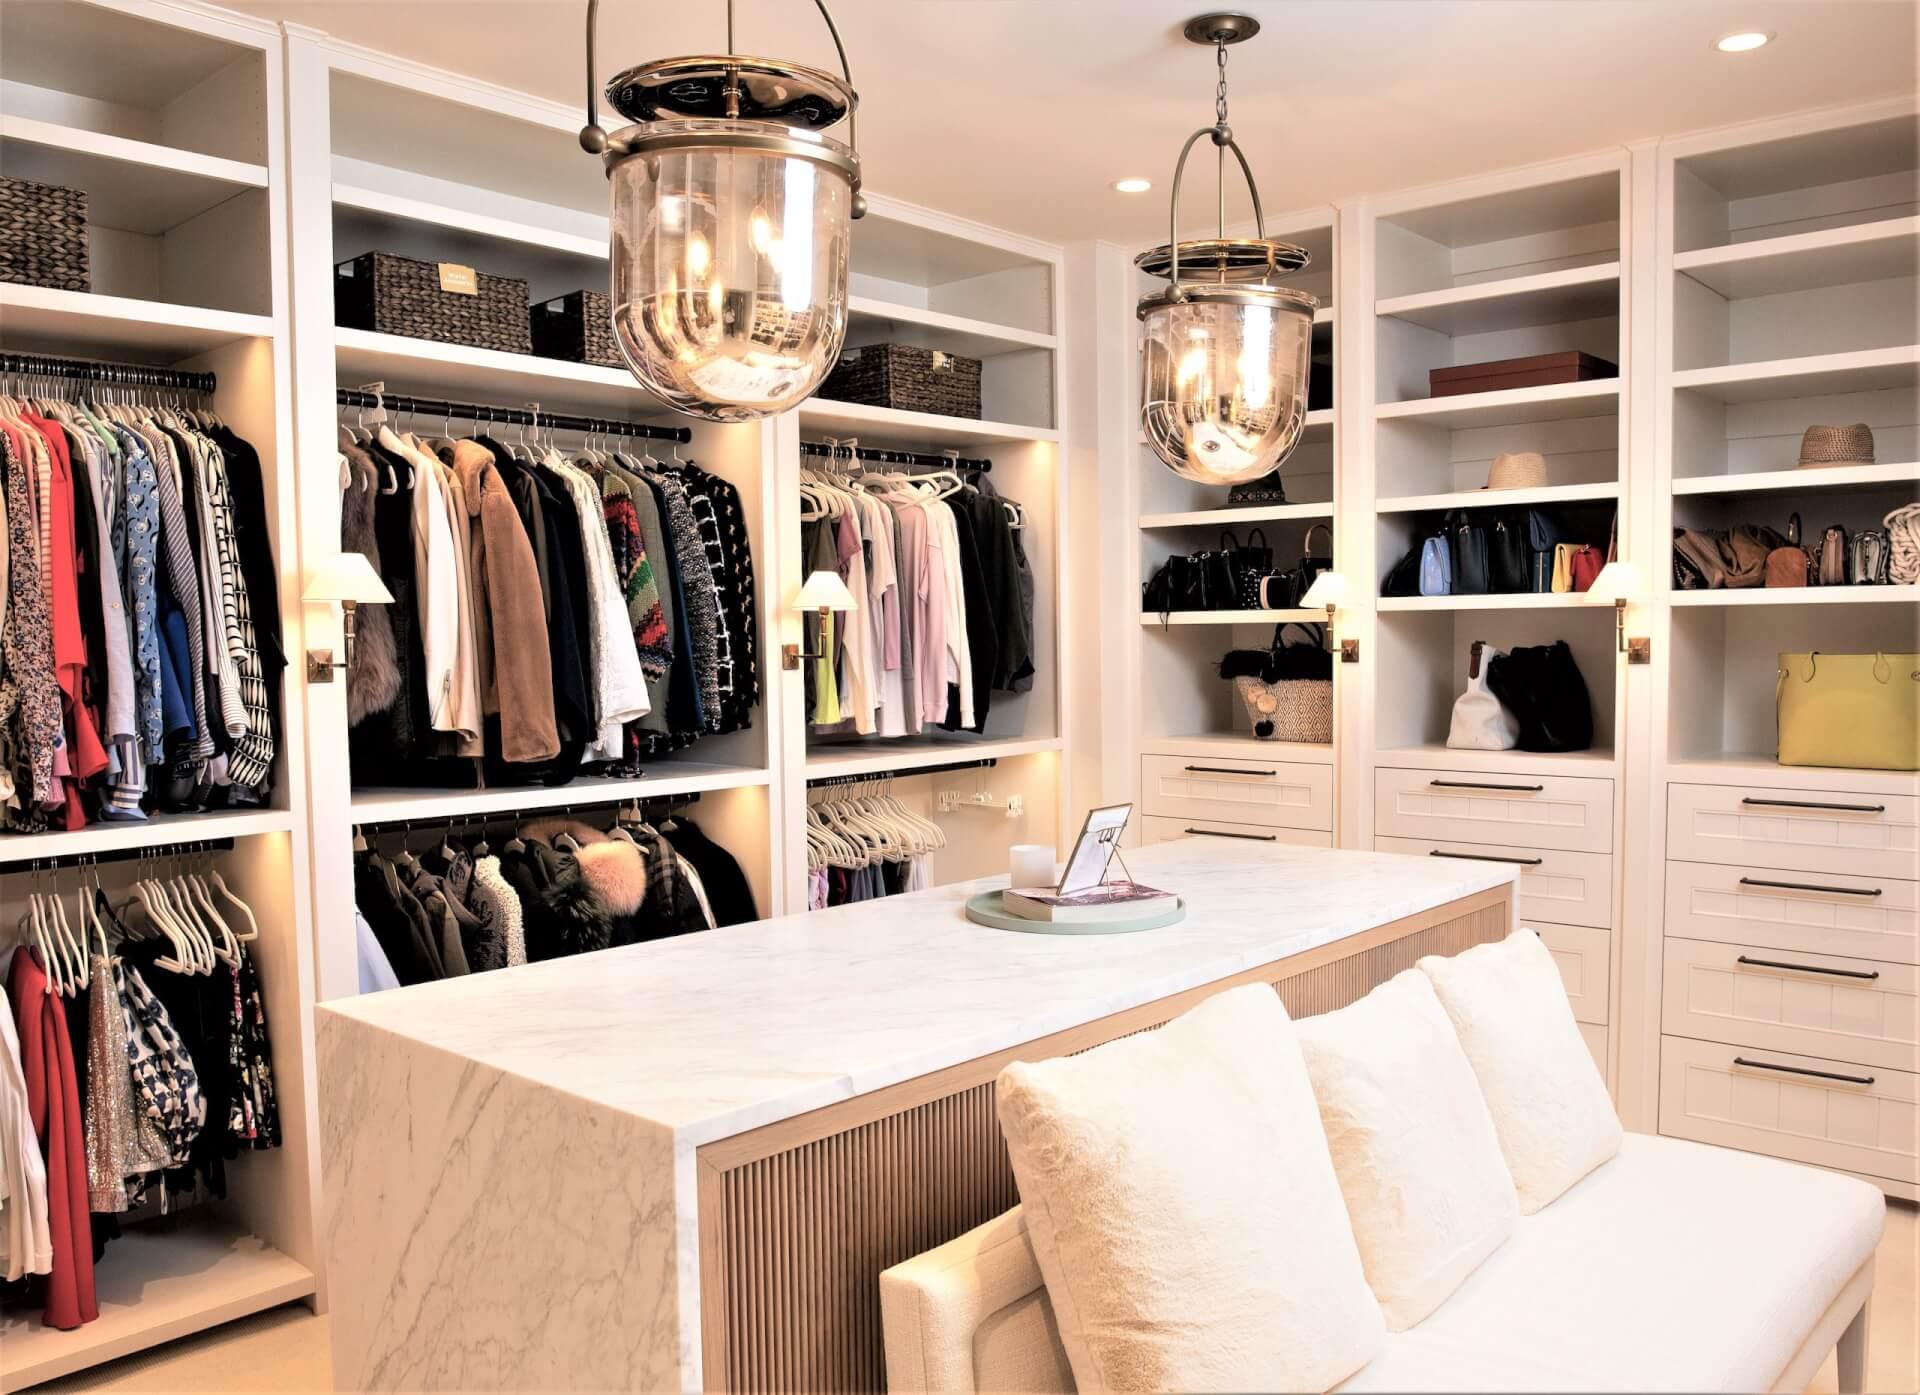 closet company costume closets in nashville - The Closet Company